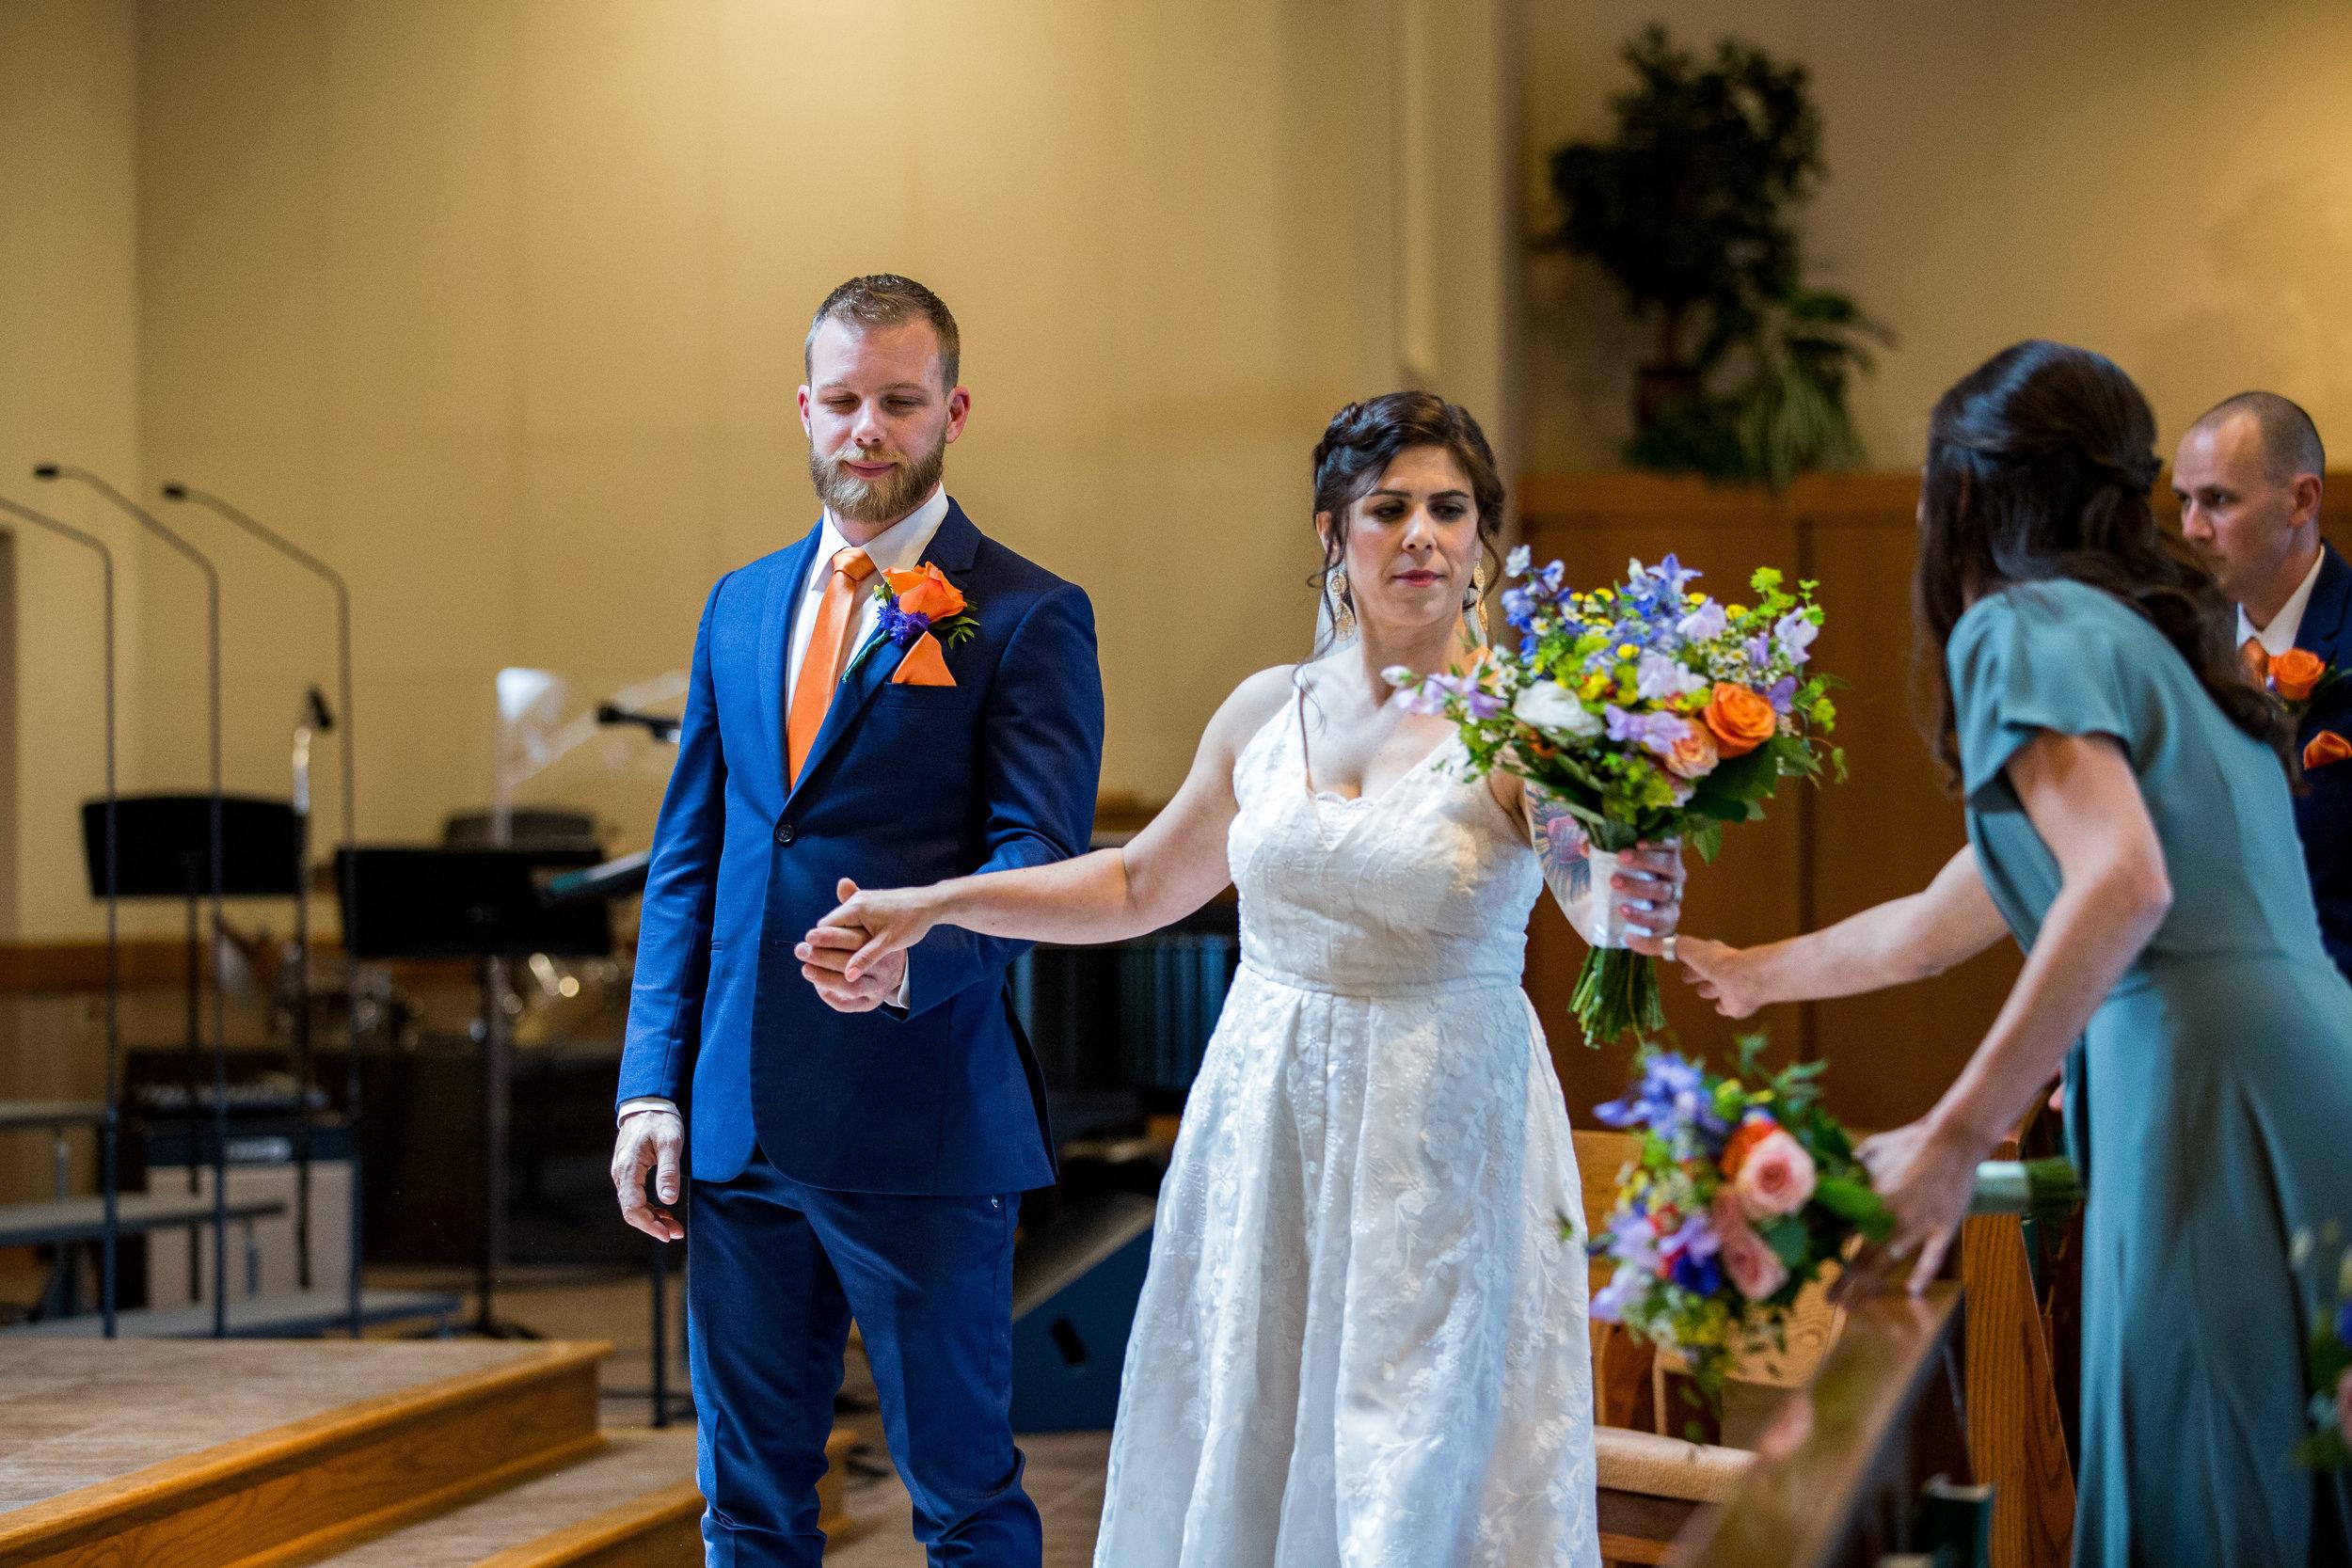 Natalie and Dallas Mooney Wedding 6-8-19_Tania Watt Photography-106.jpg